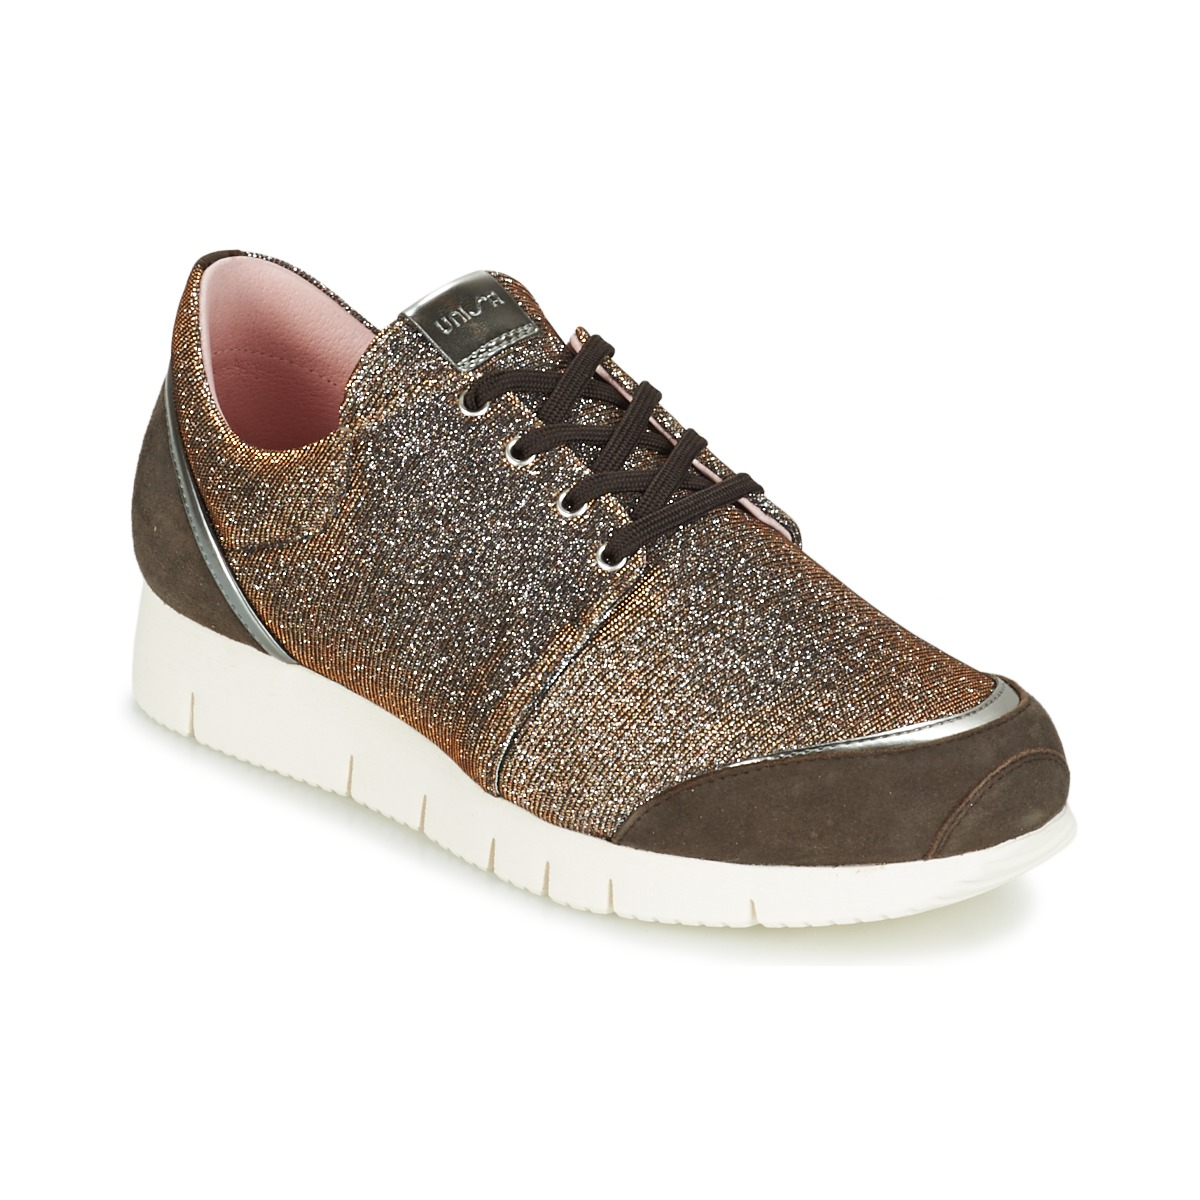 Unisa BOMBA Silbern - Kostenloser Versand bei Spartoode ! - Schuhe Sneaker Low Damen 65,90 €